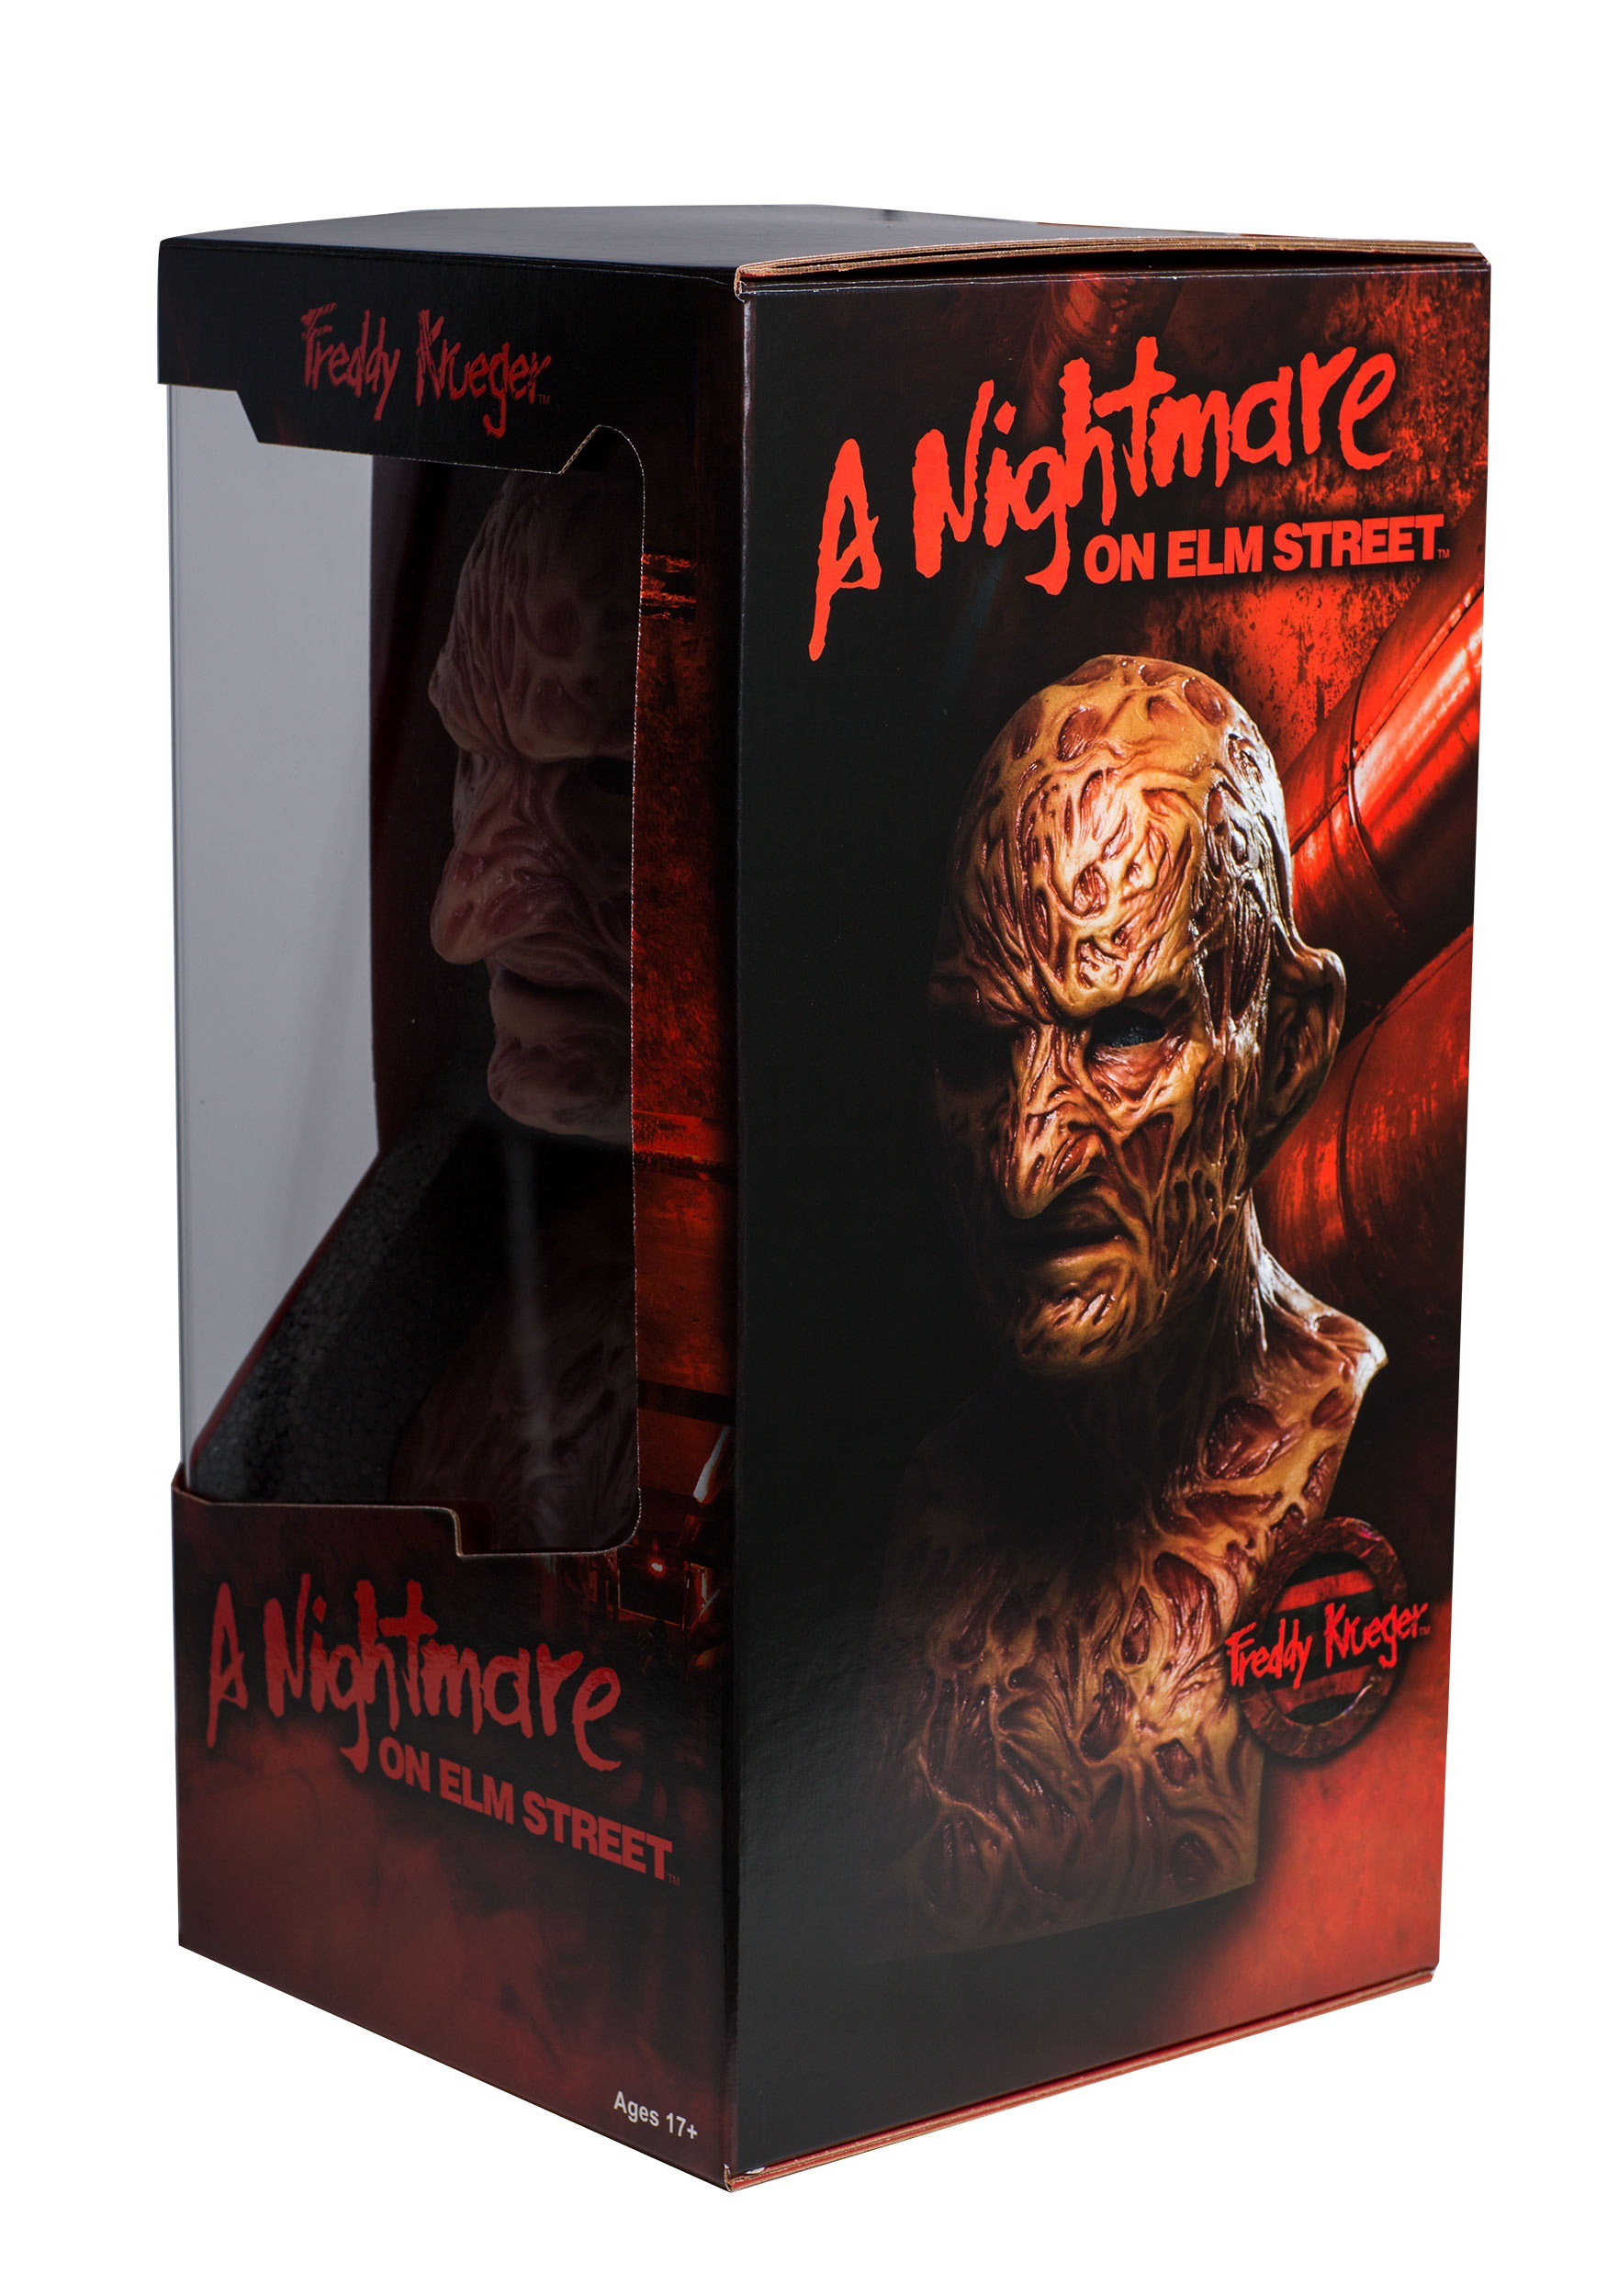 Freddy a nightmare on elm street - 2 part 4